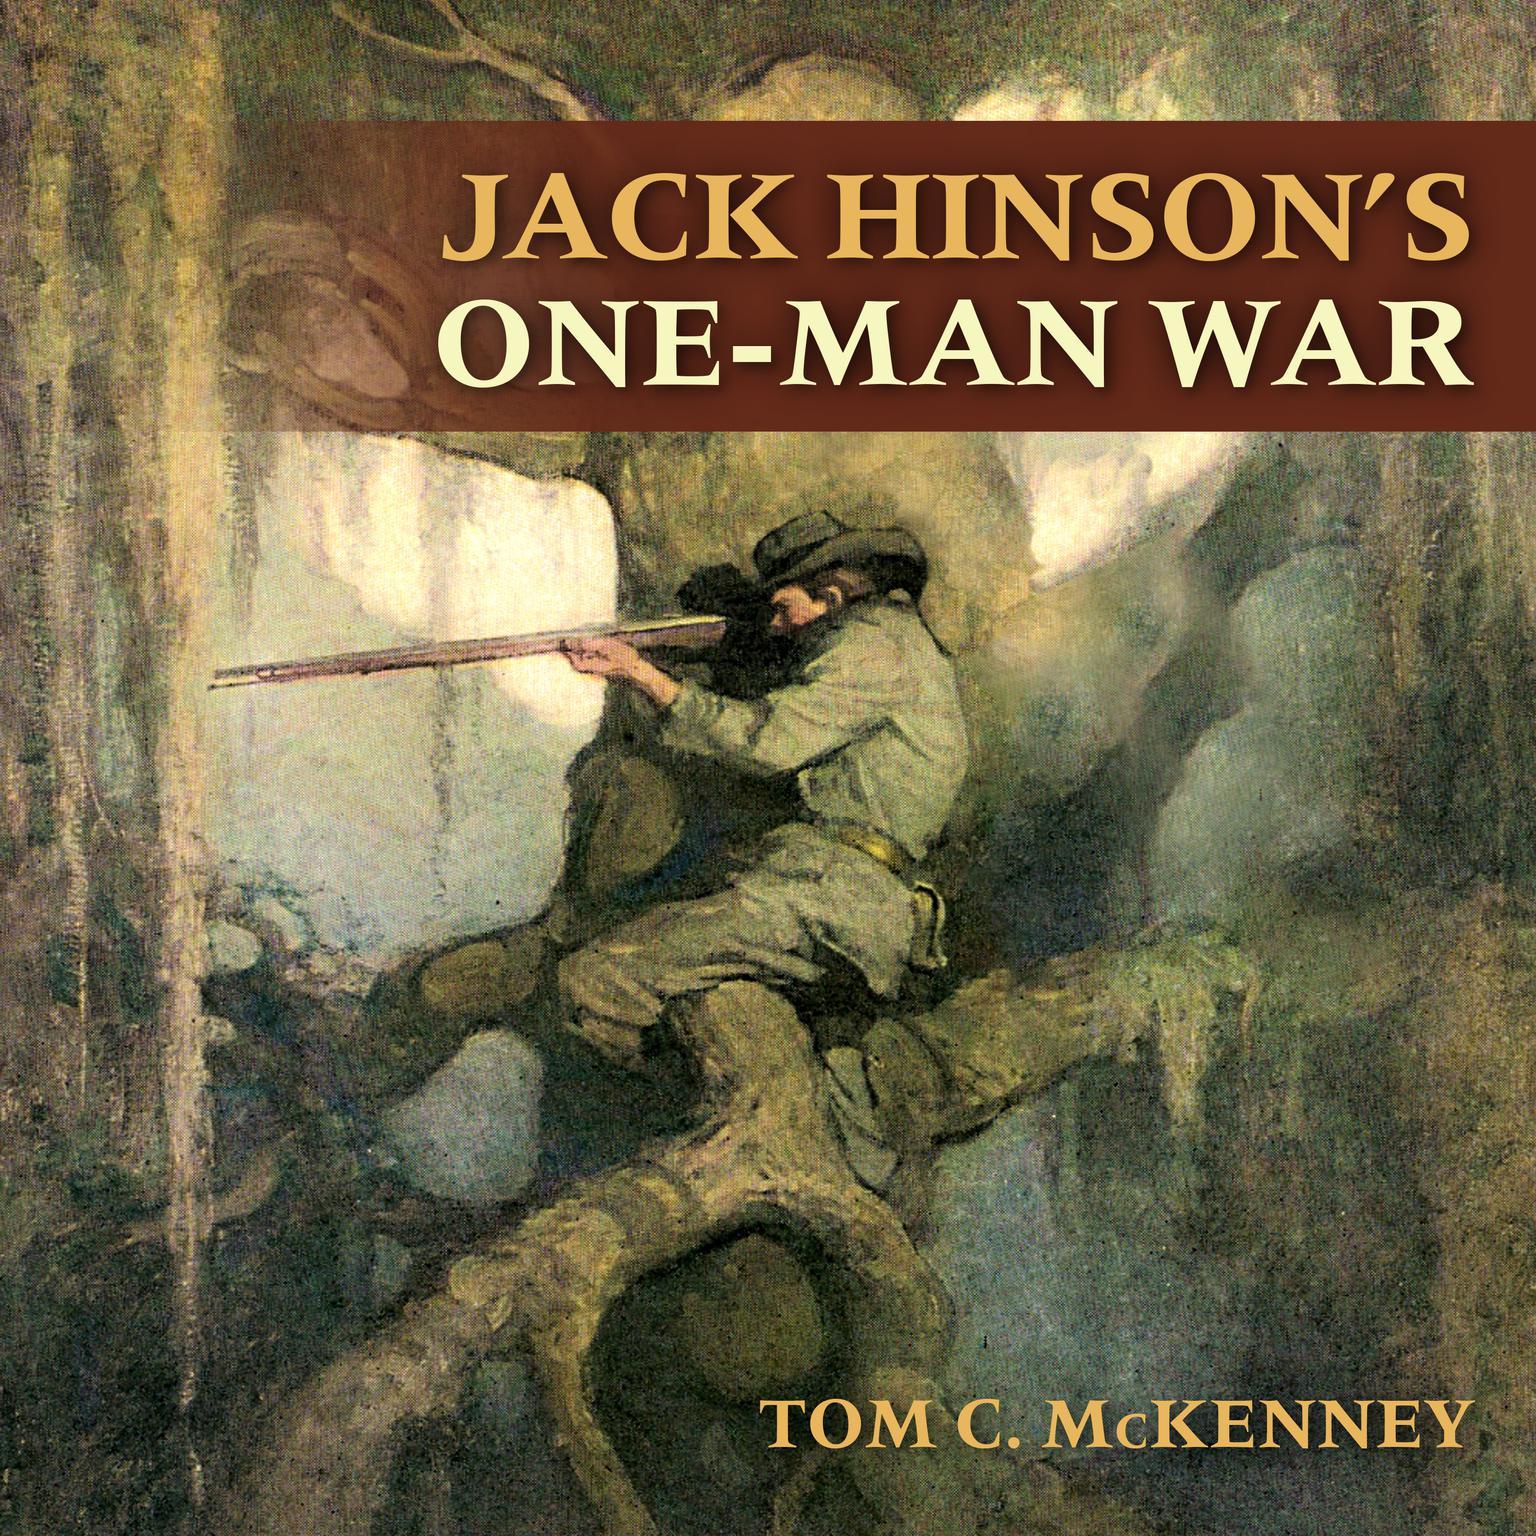 Jack Hinson's One-Man War Audiobook, by Tom C. McKenney